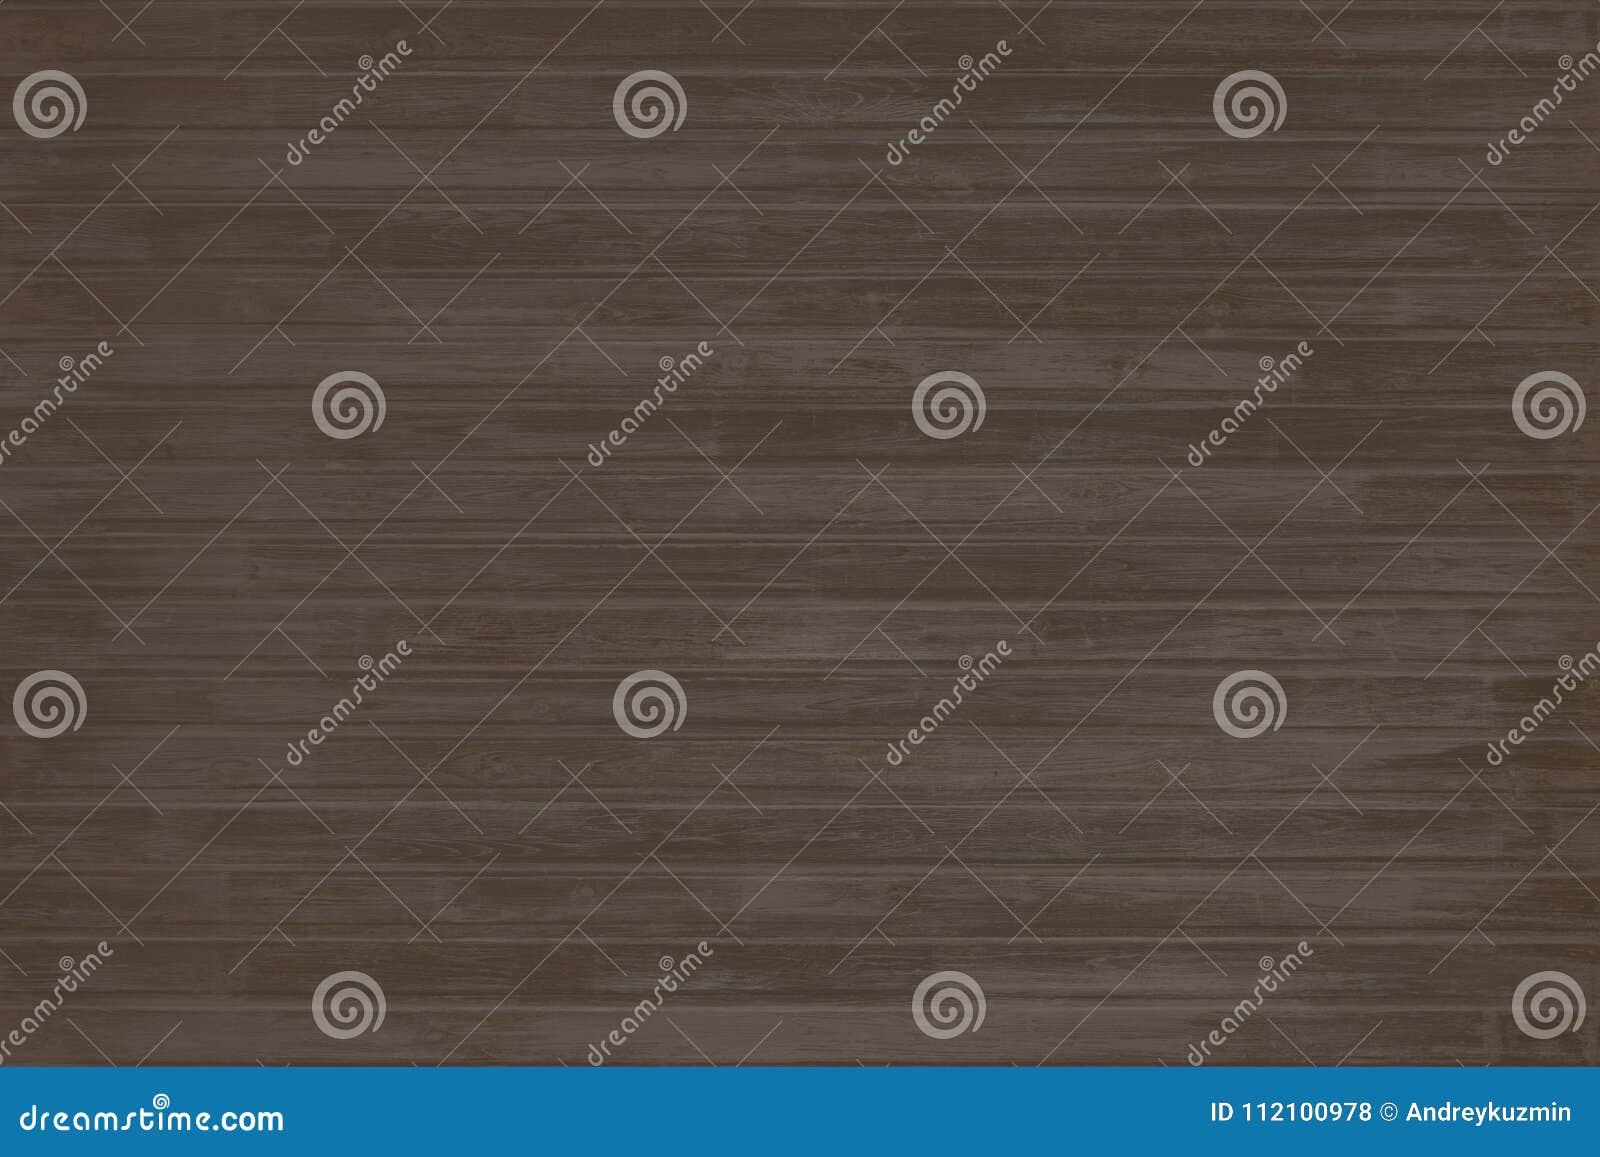 download dark brown wood floor texture or background stock photo image of wall wooden dark brown wood floor texture a51 wood